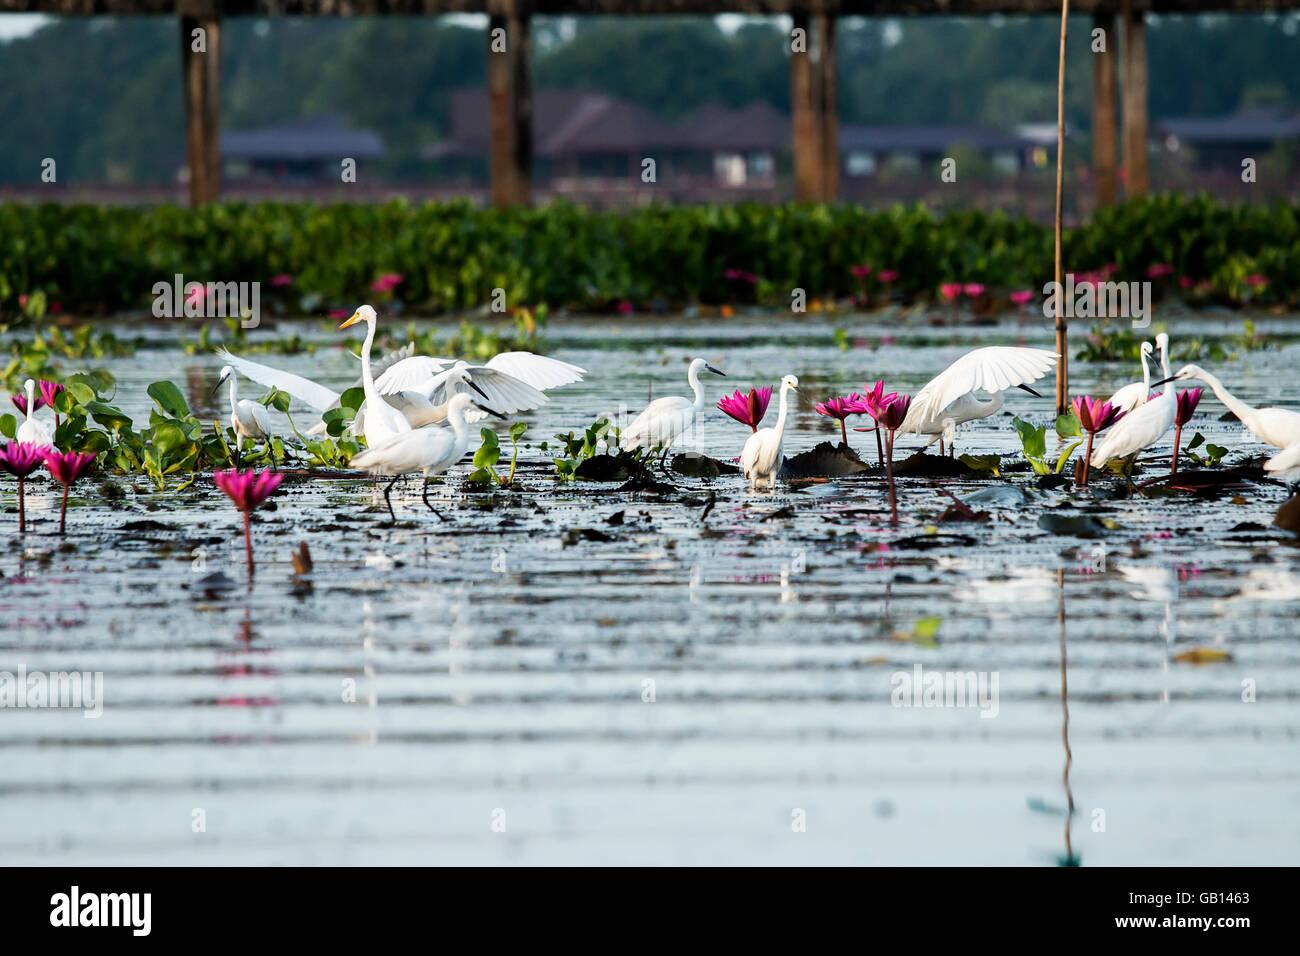 Flocks of Egret on the lake Thale Noi, Phatthalung, Thailand. - Stock Image